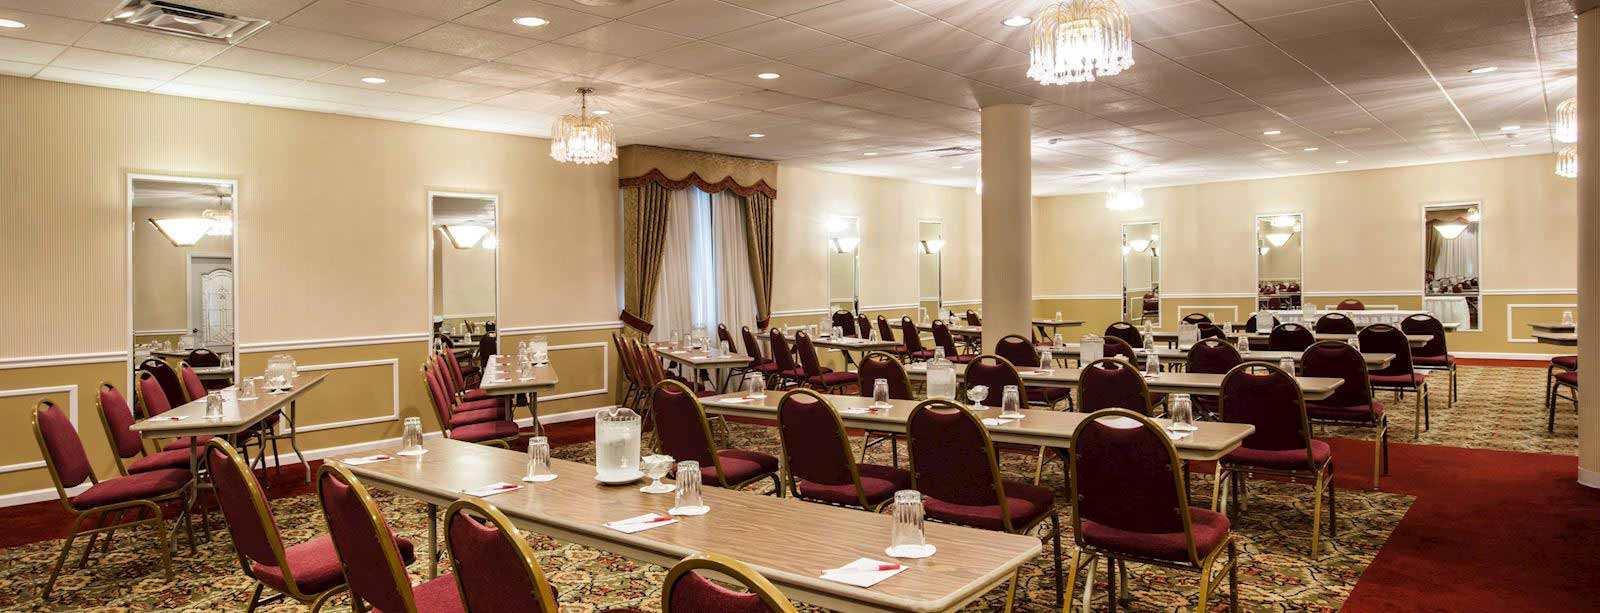 Hotel in ligonier, Pennsylvania